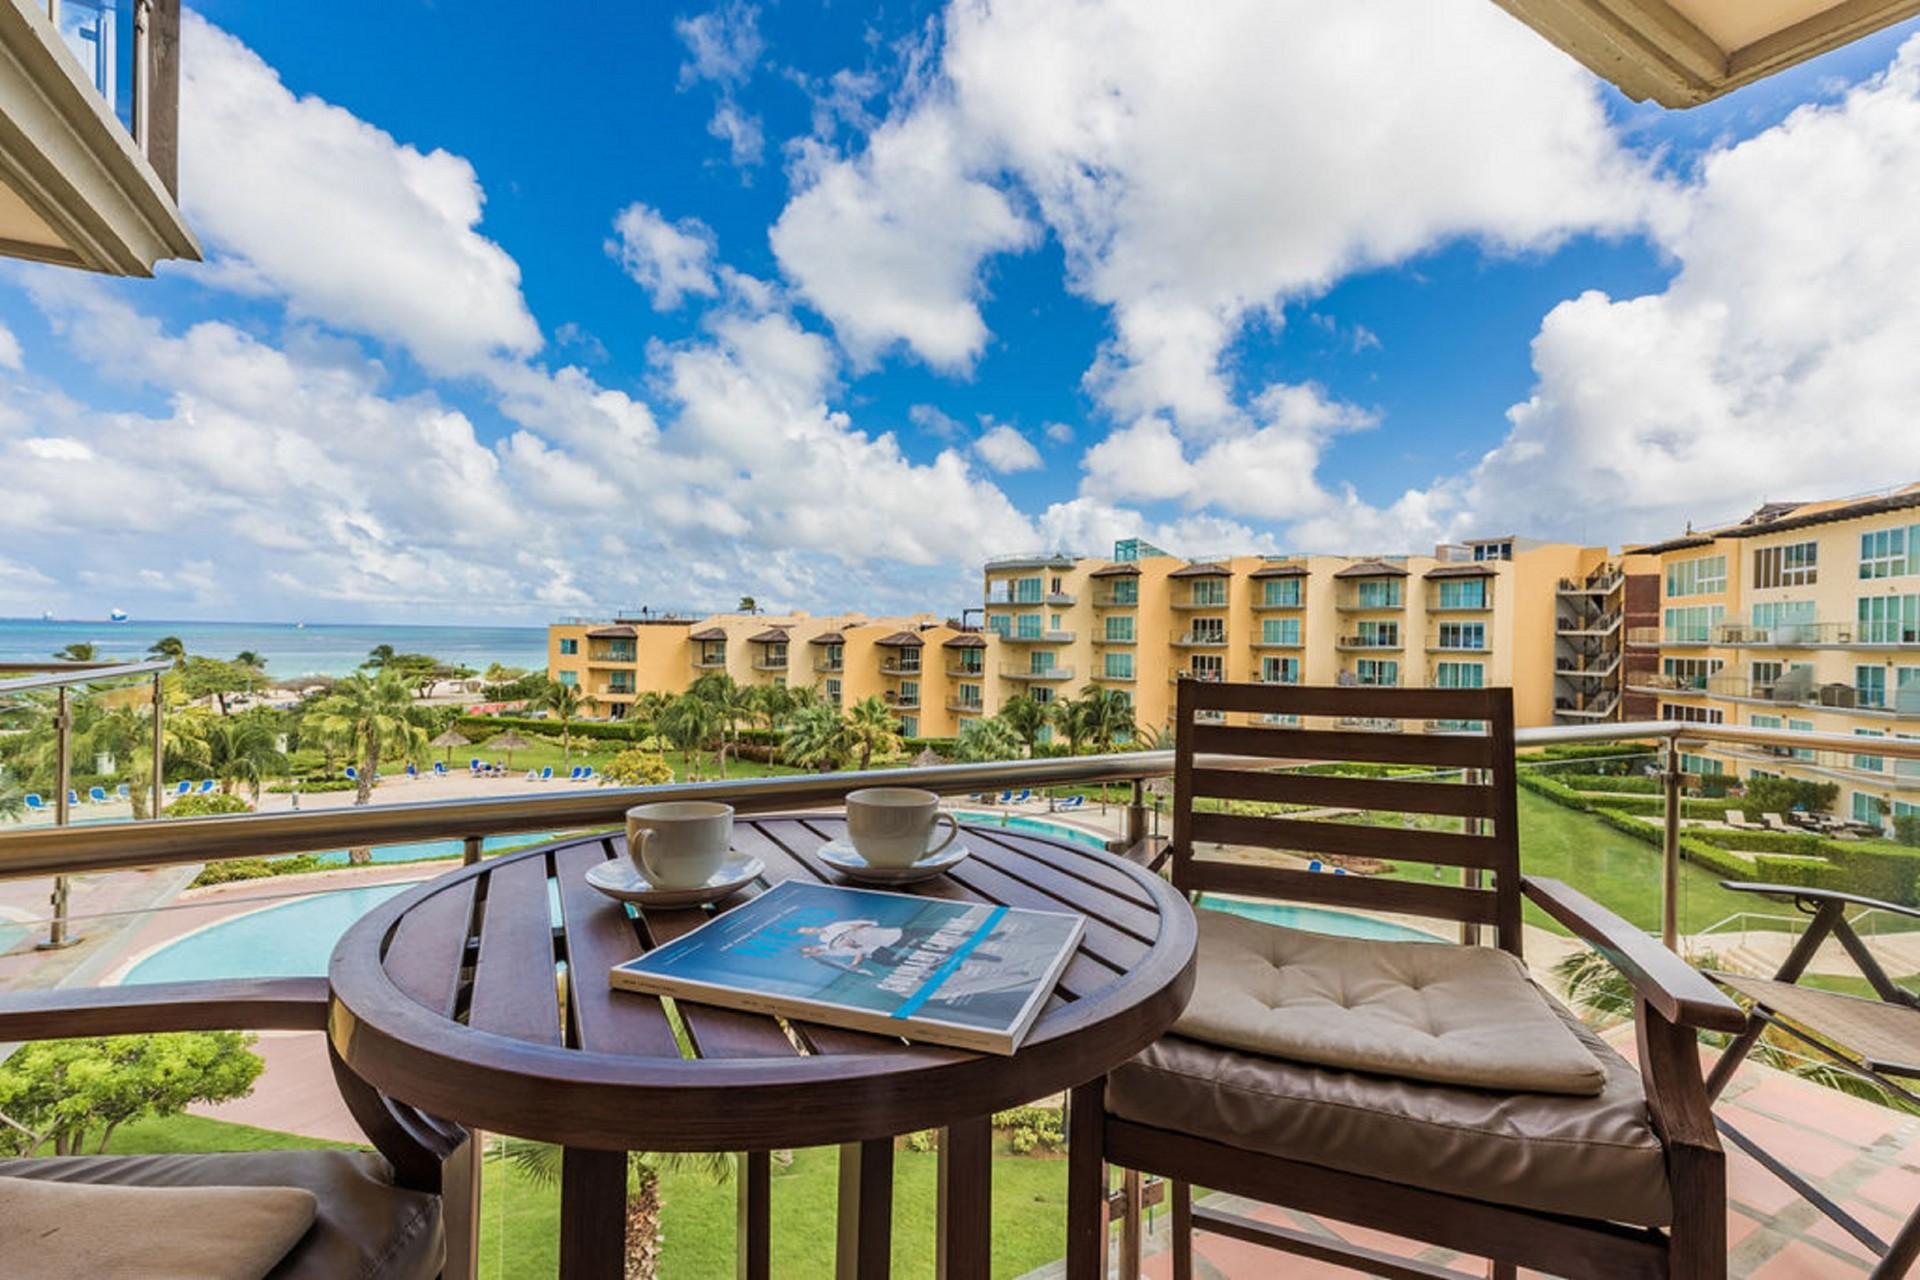 Oceania 432- Large 1 bedroom Ocean Front Condo w amazing views photo 2